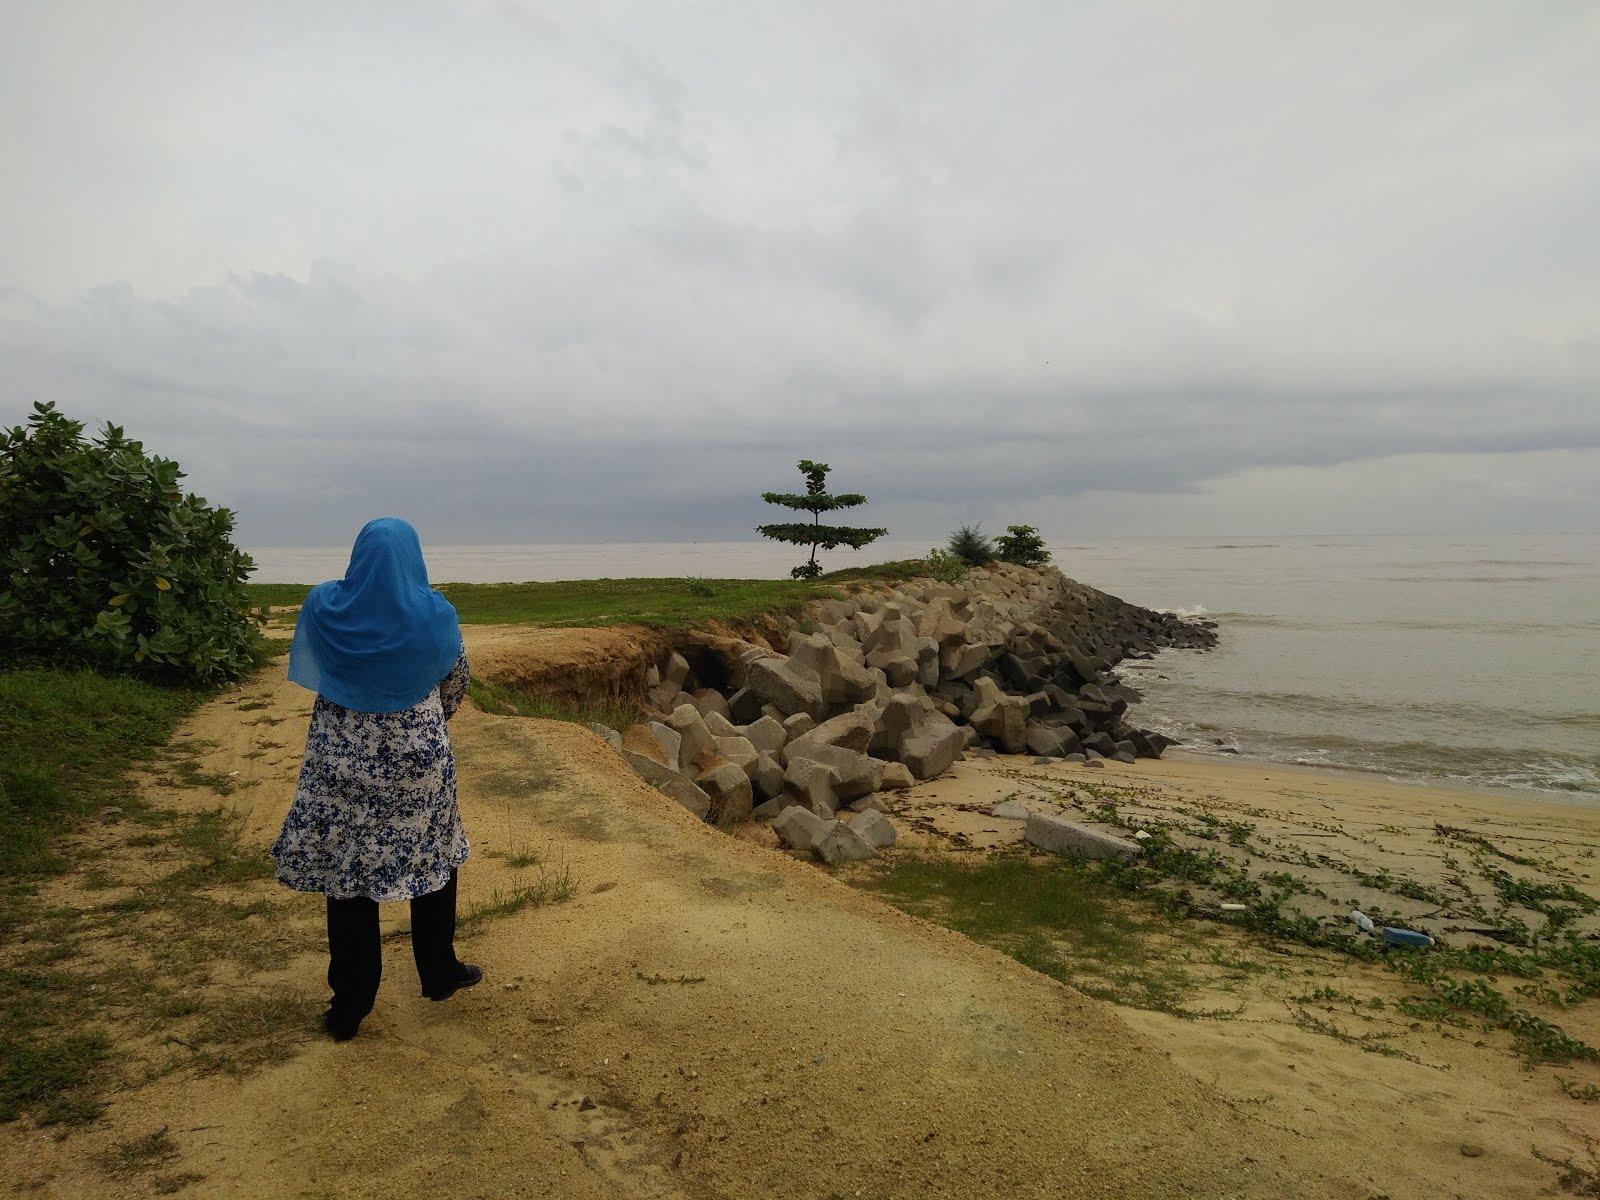 Pantai Teluk Lipat, Dungun